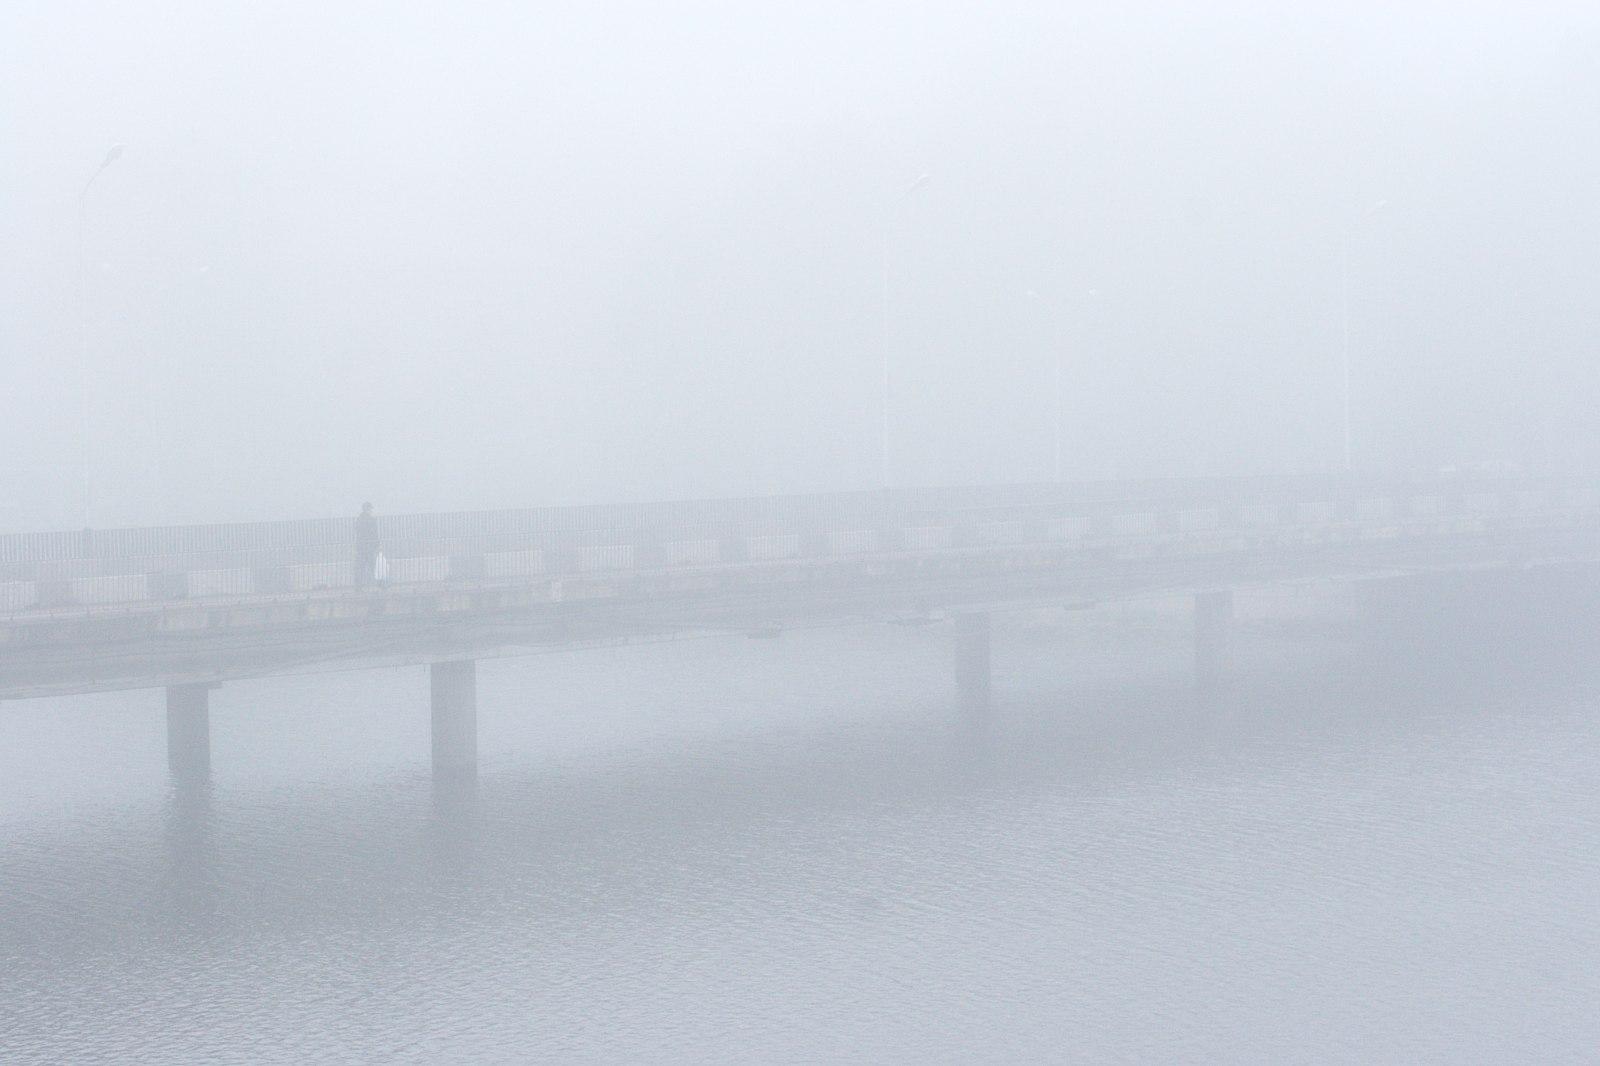 Silhuette on a bridge